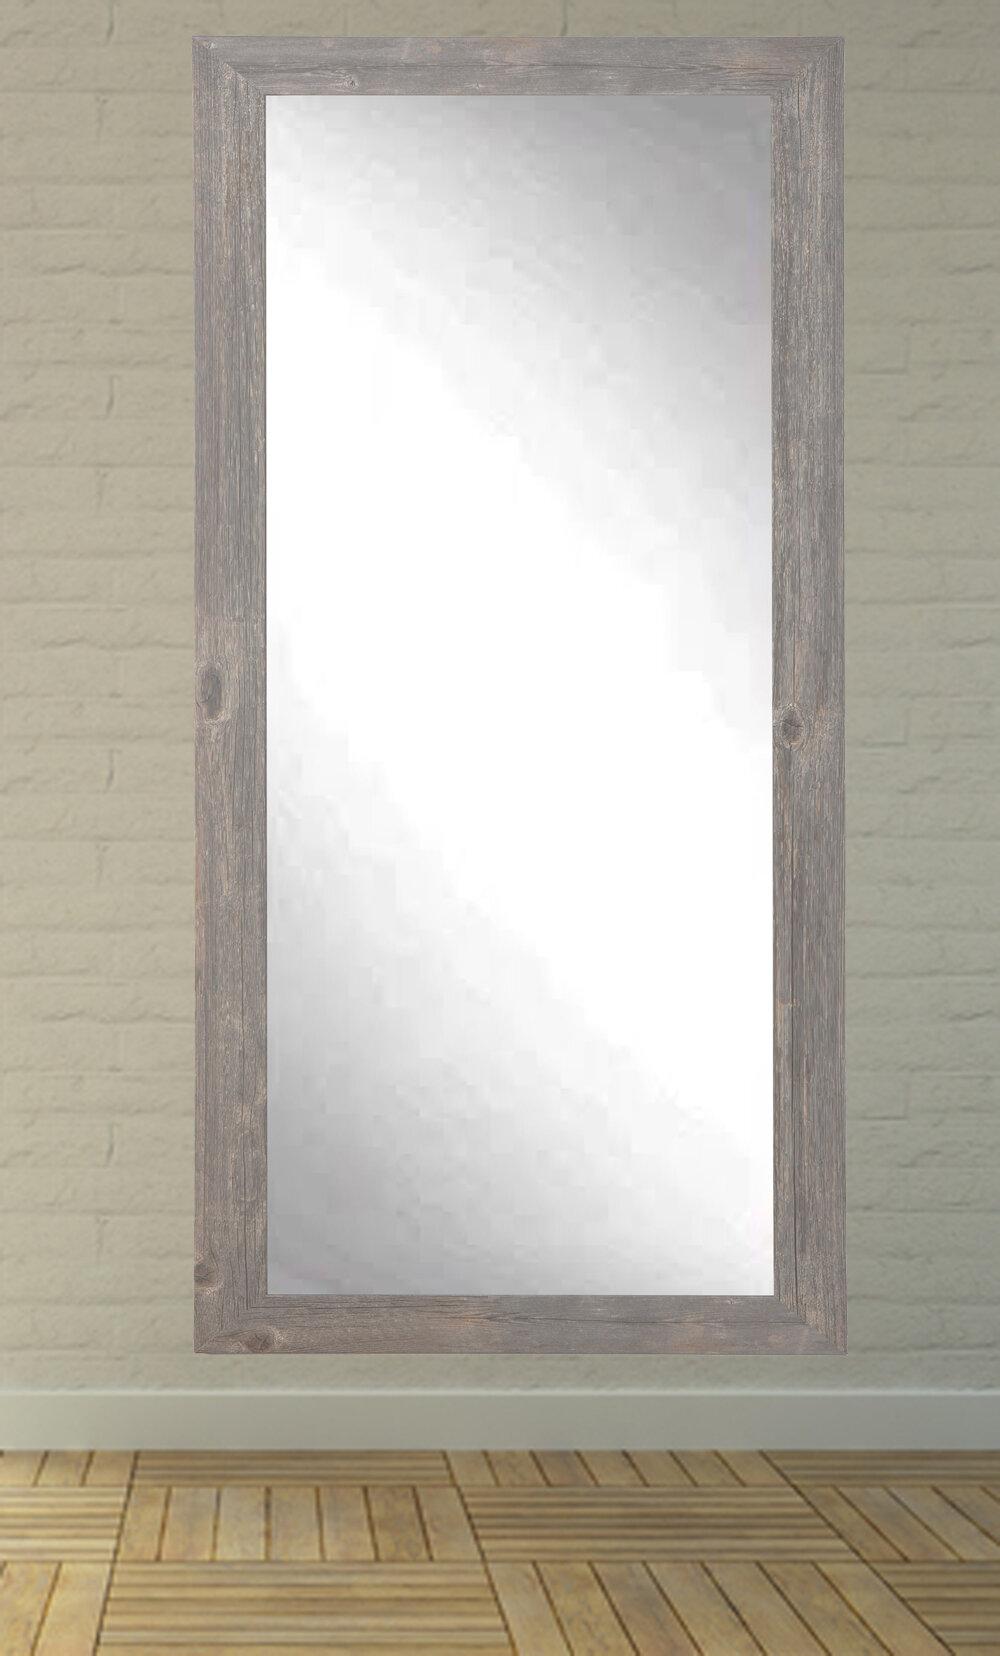 Iona Rustic Wild West Barnwood Full Length Wall Mirror